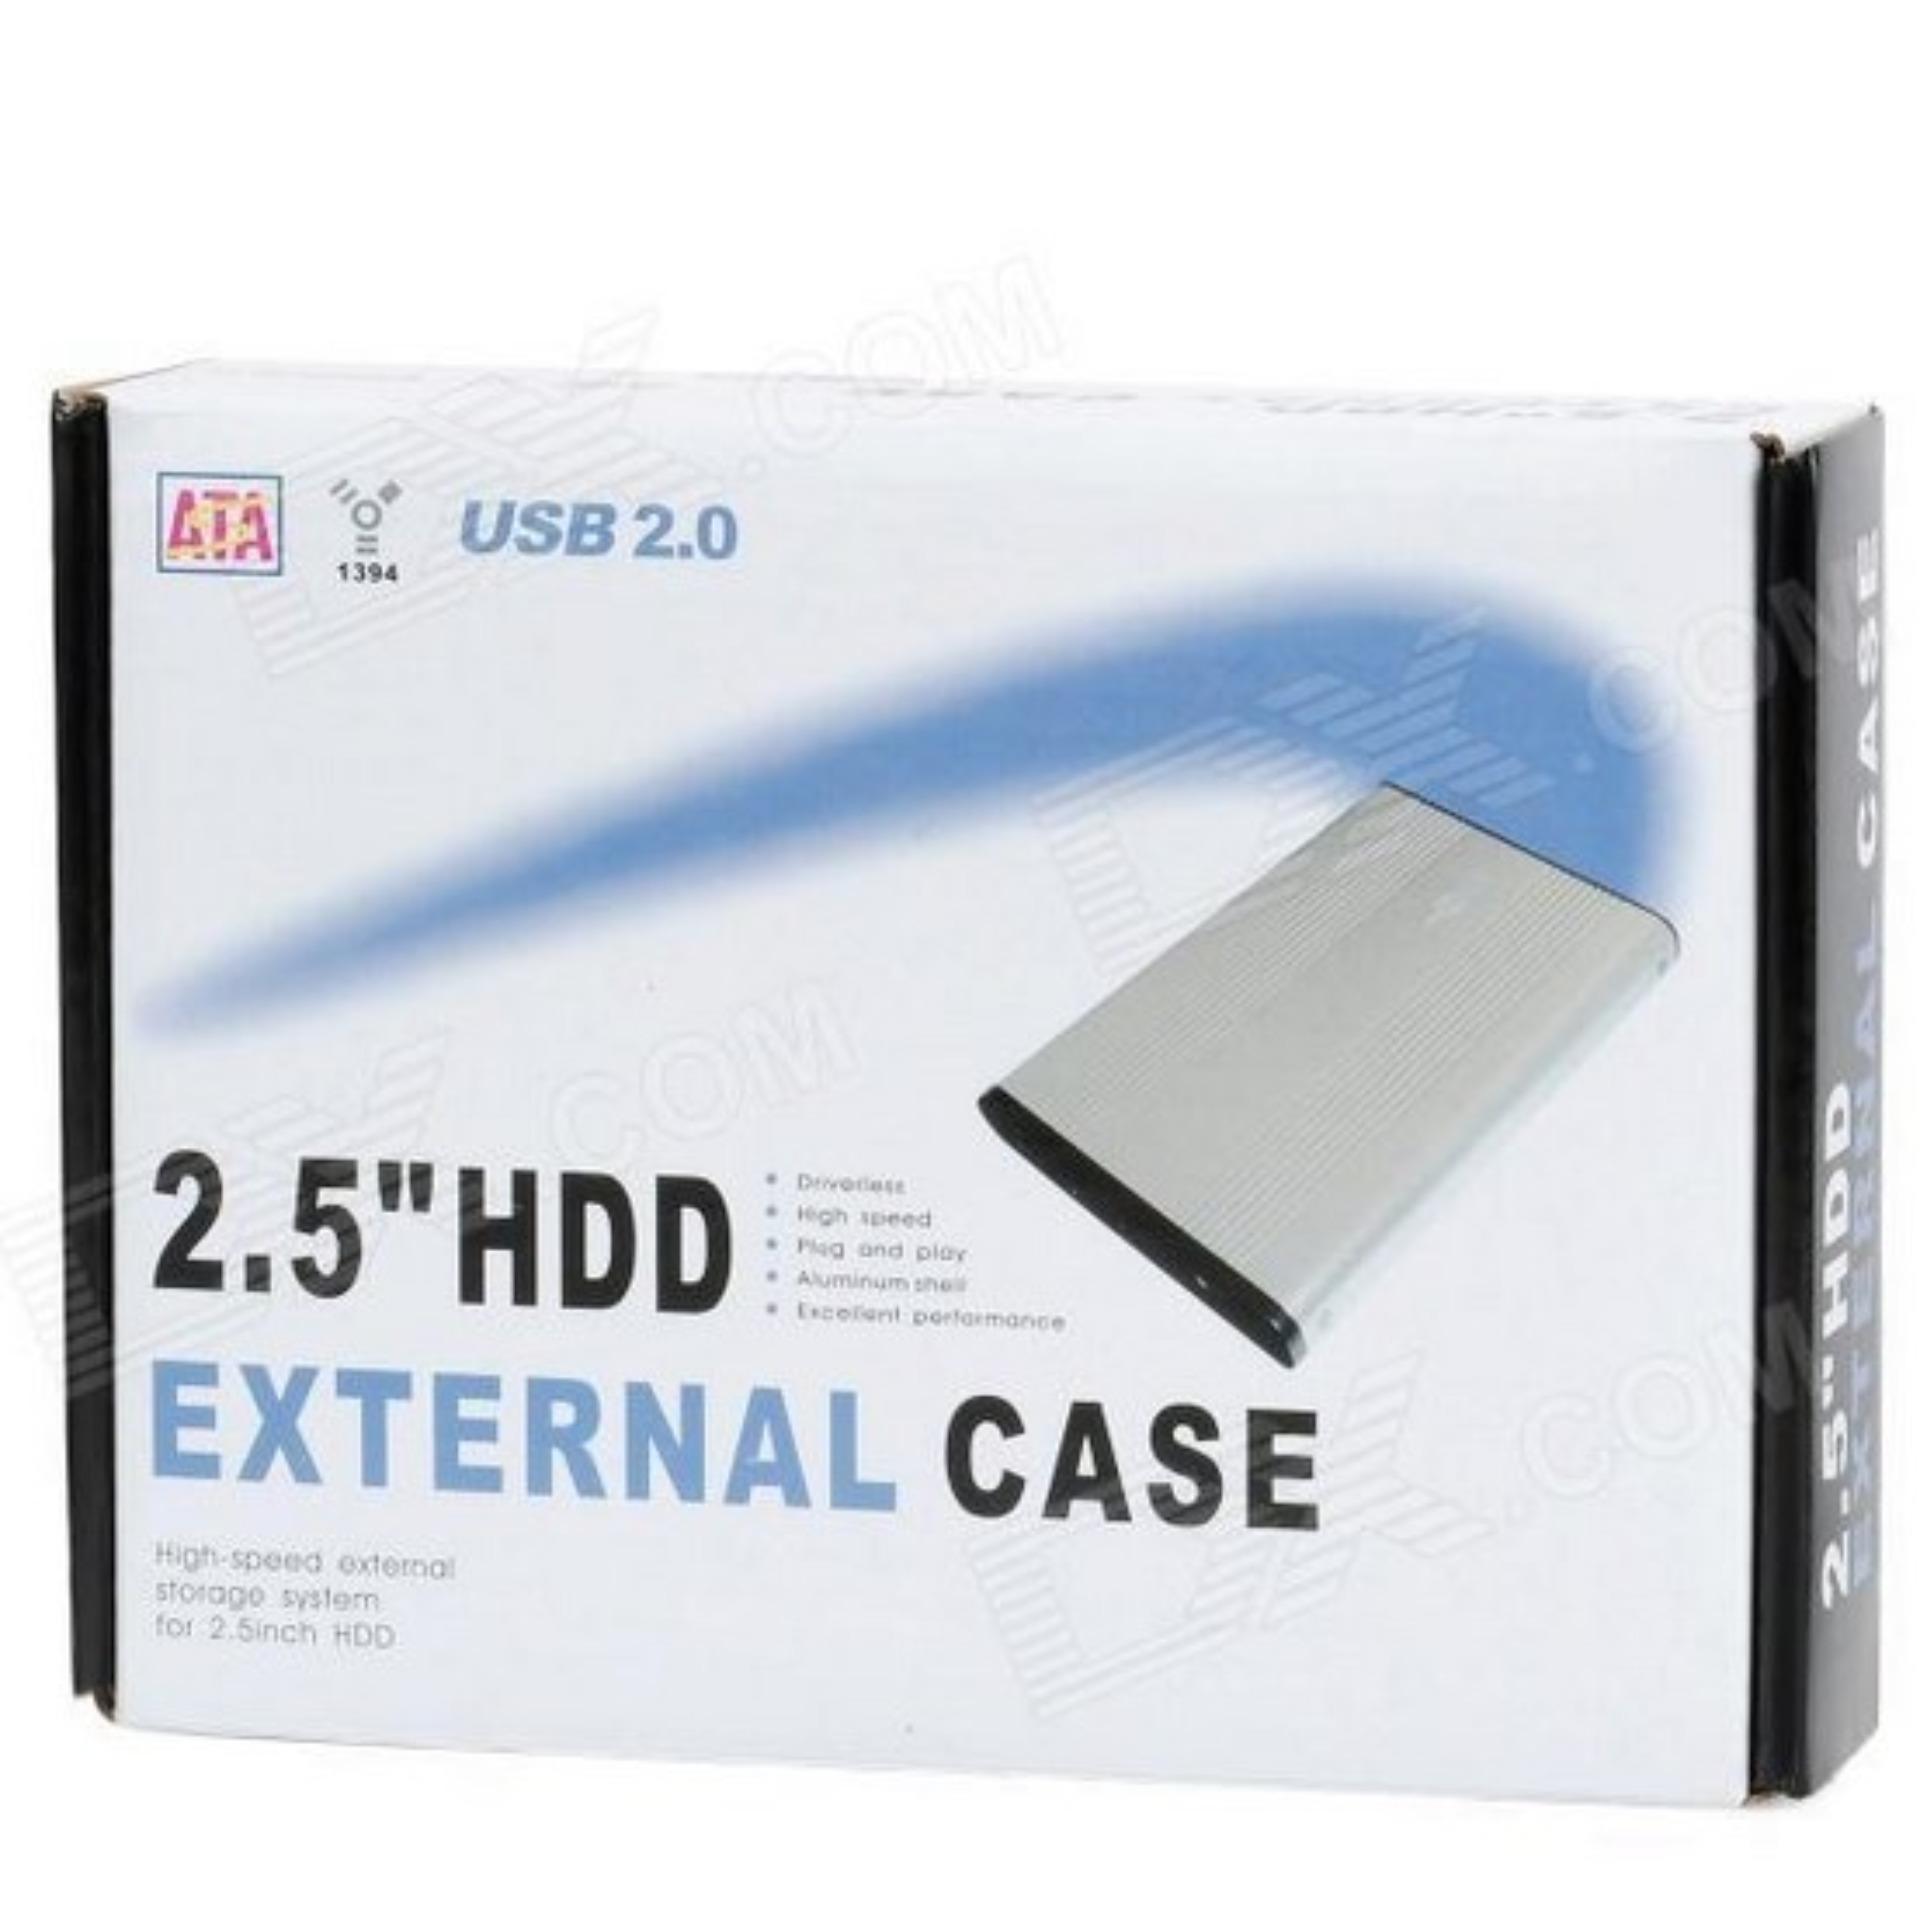 Online Murah 25 Inch External Case Usb 20 Sata Hdd Hardisk Drive Casing Laptop Enclosurebox Hard Disk Eksternal Notebook Netbook Silver